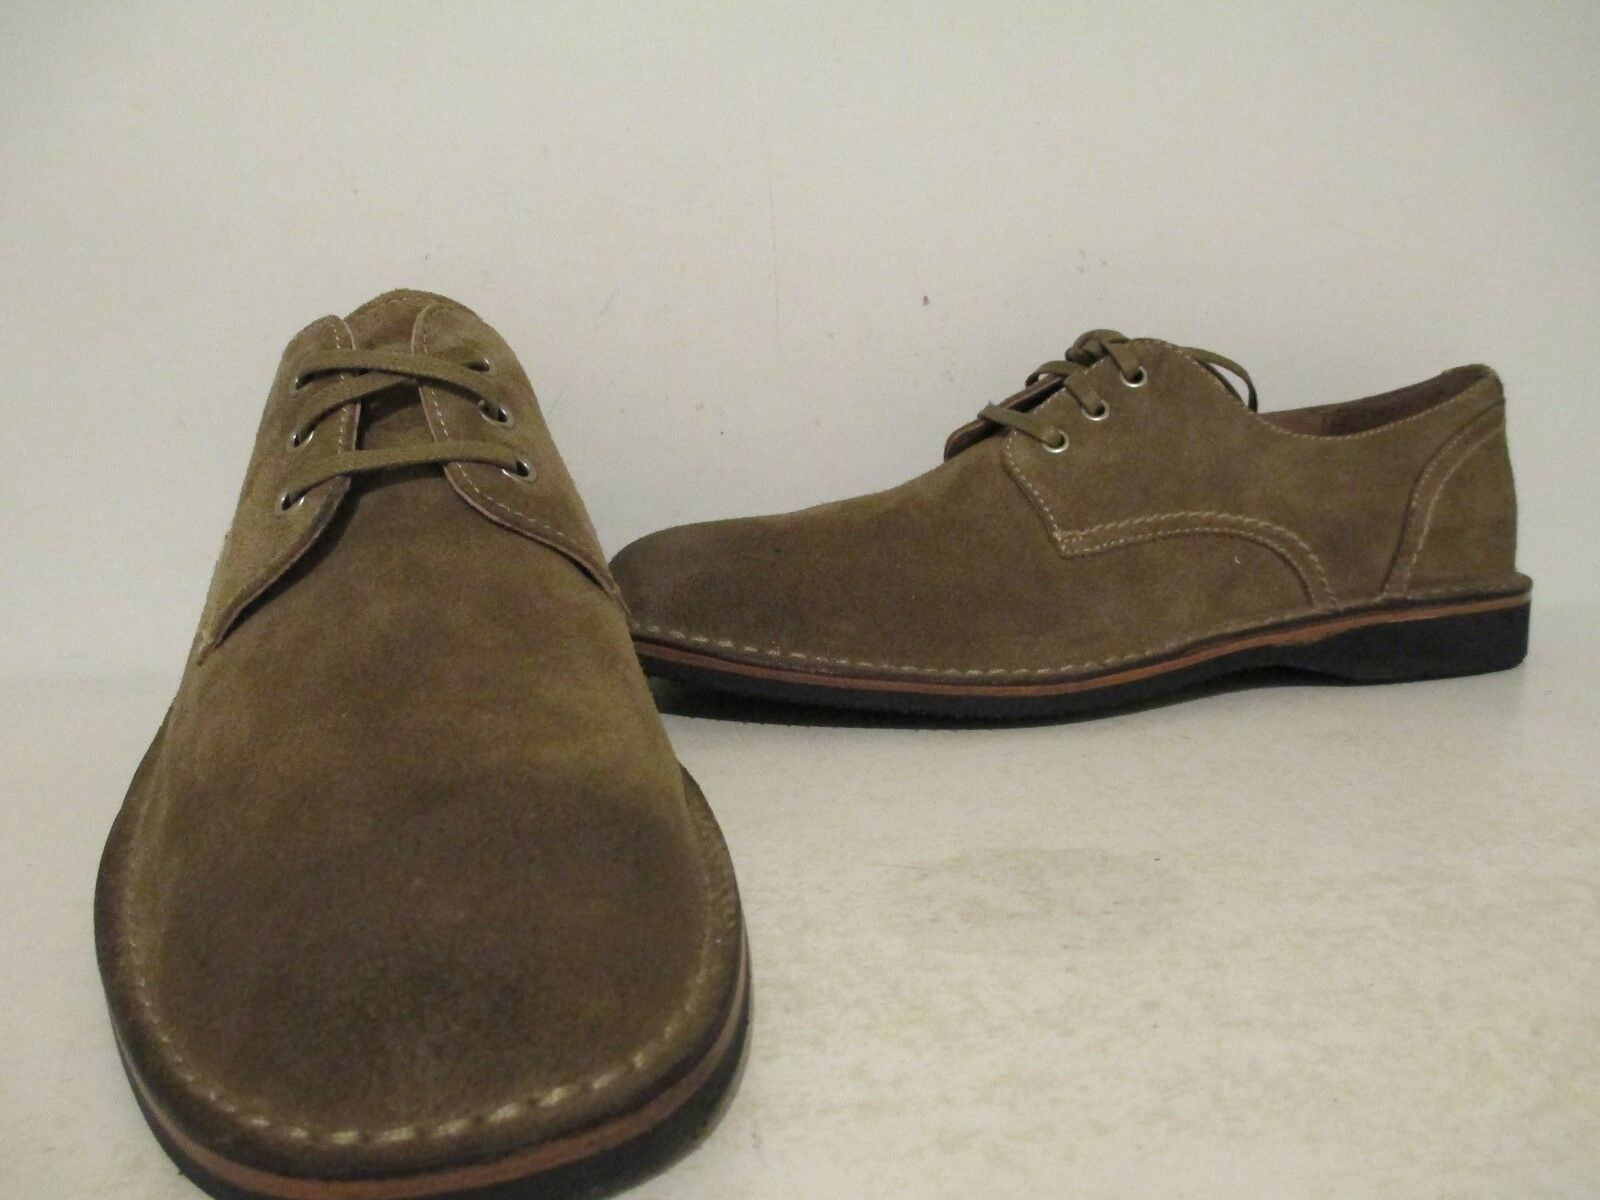 Andrew Marc Mens Dorchester Leather Oxford shoes Sand Stone Deep Natural Sz 9 D